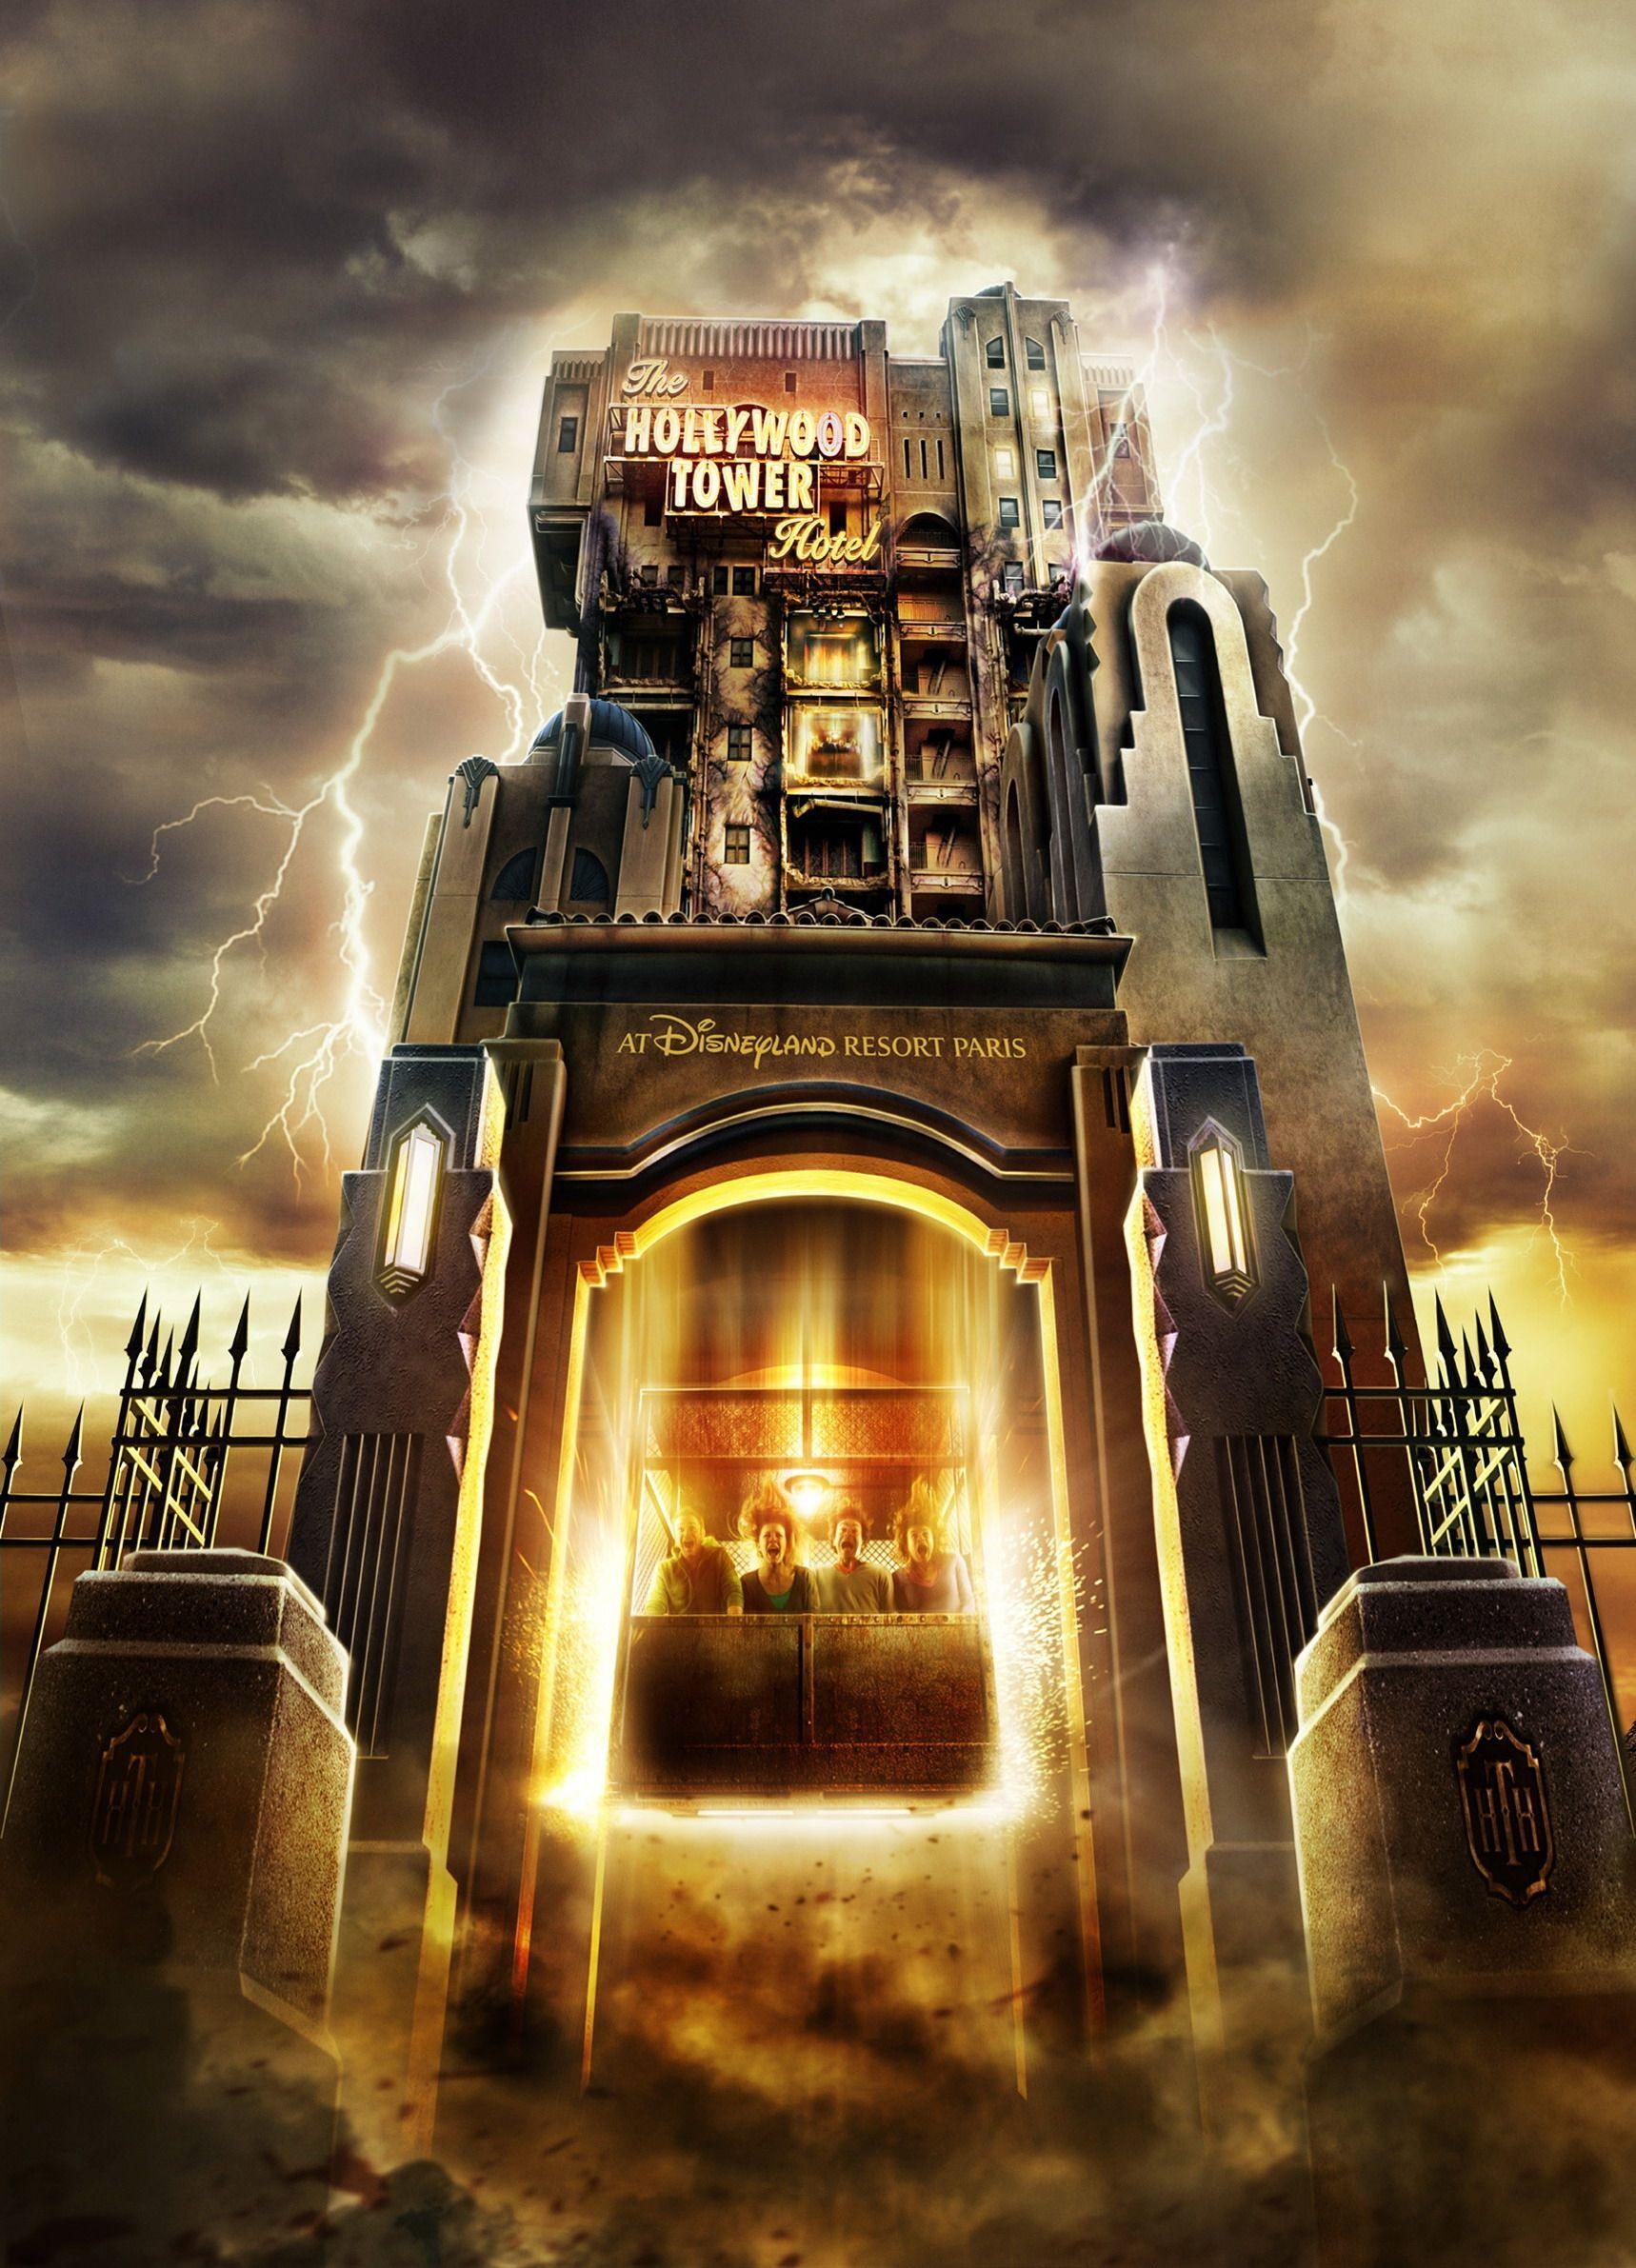 Tower of Terror Walt Disney Studios Paris